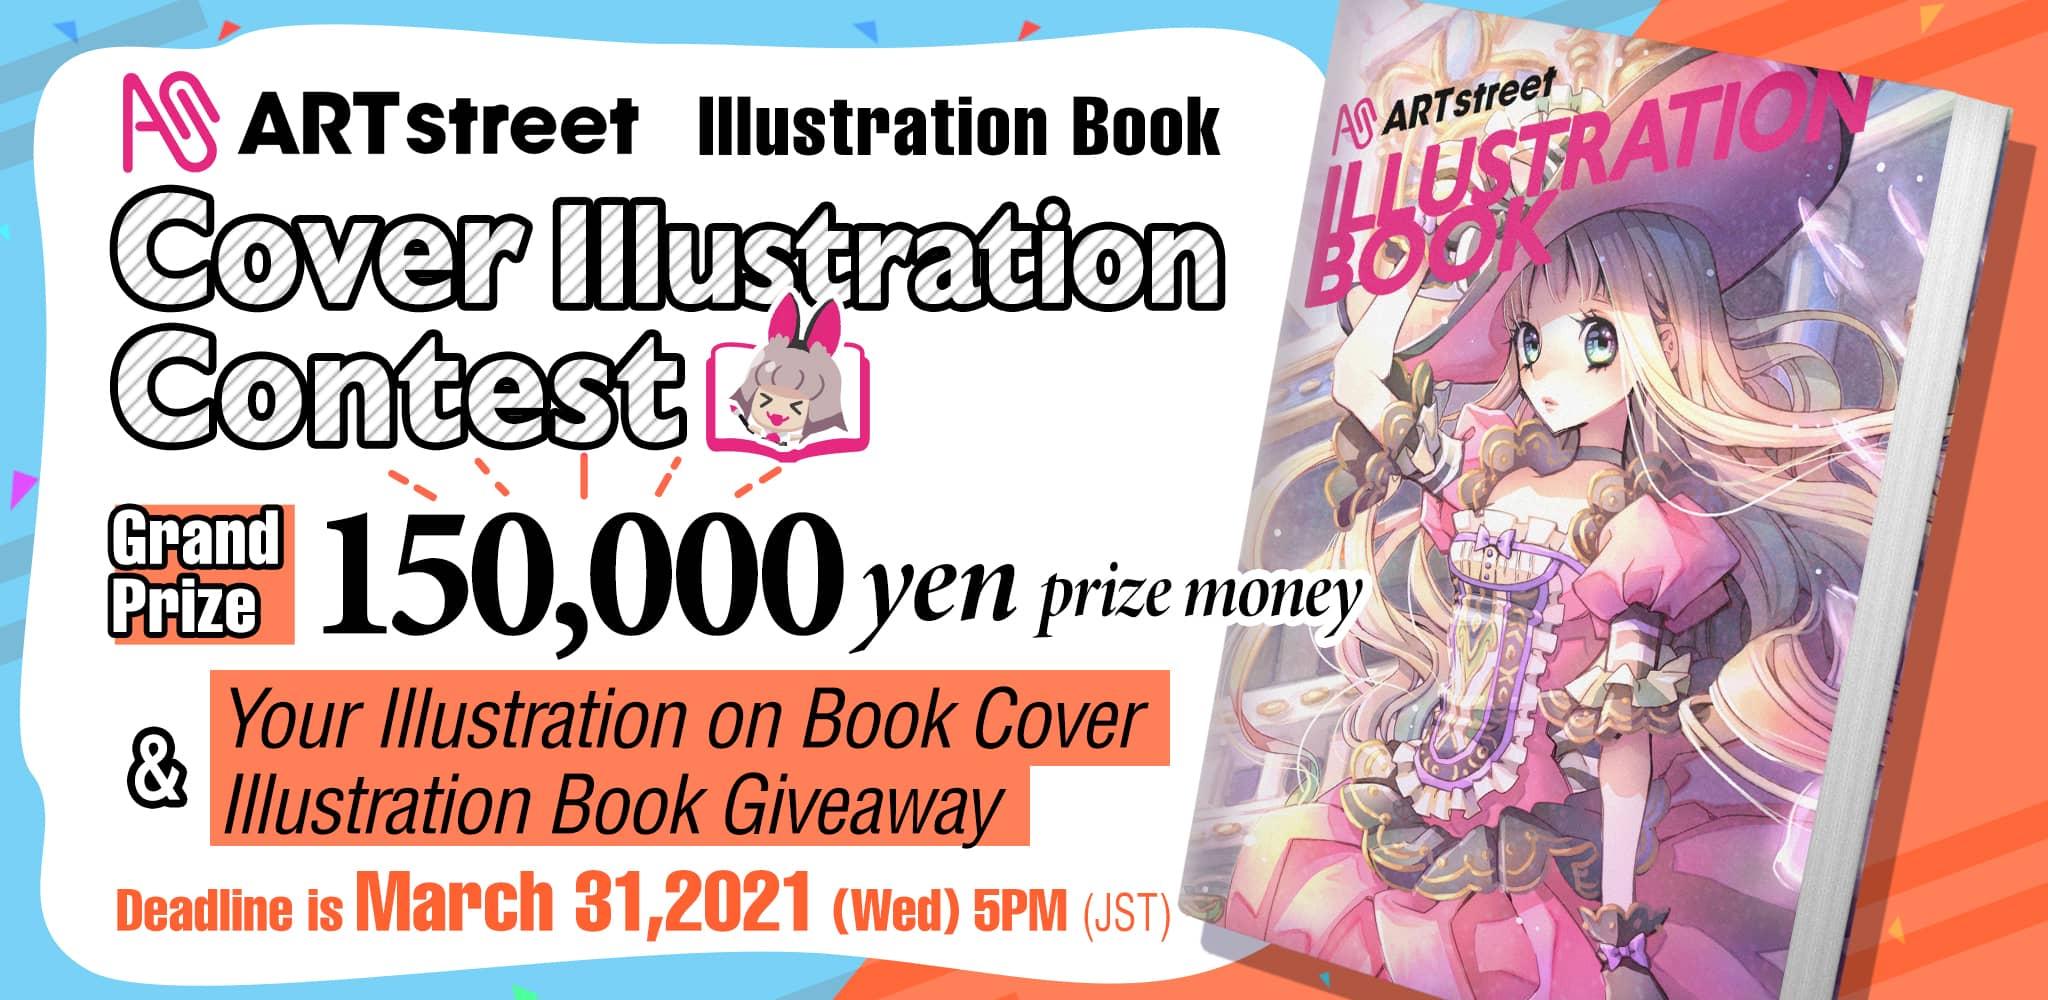 ART street Illustration Book Cover Contest